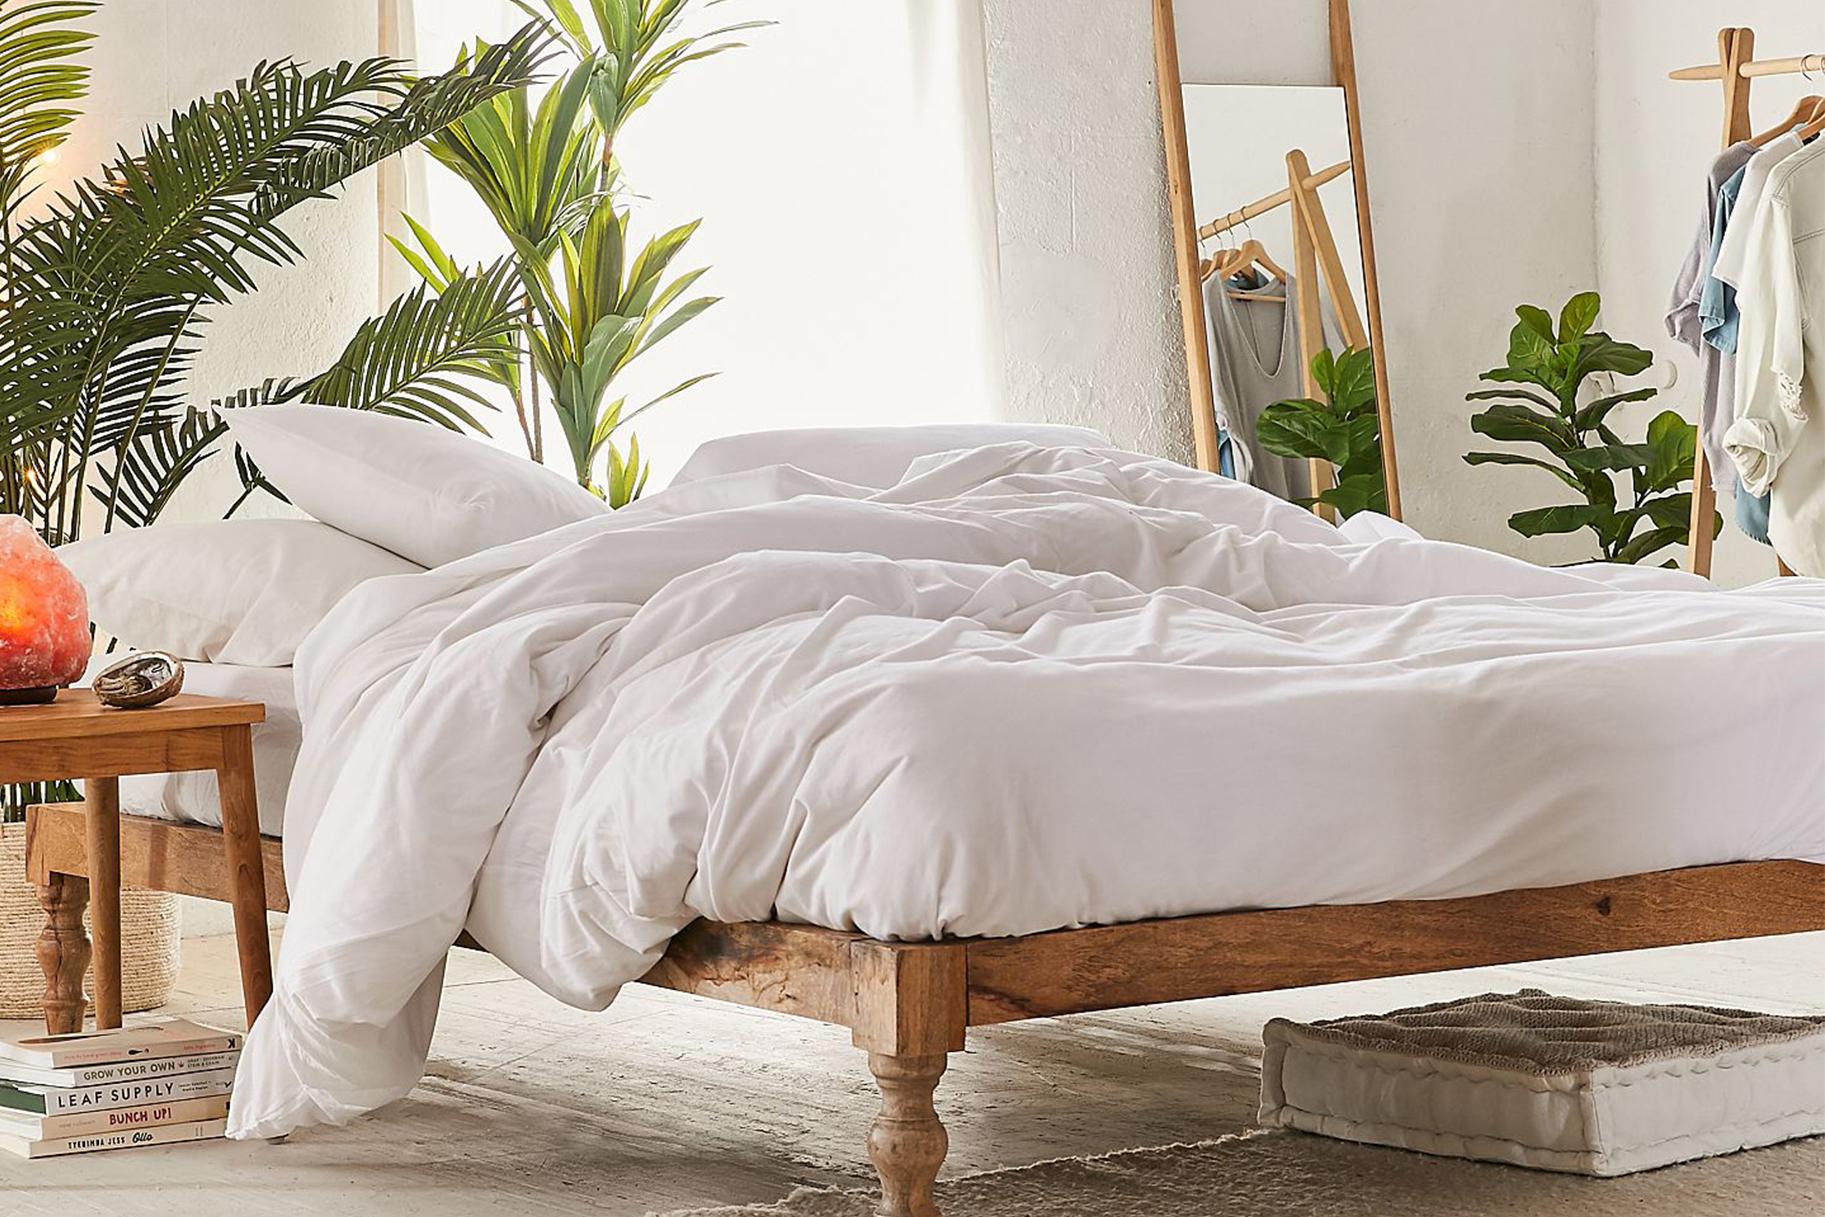 Fresh No Box Spring Bed Frame Image Of Bed Decoration